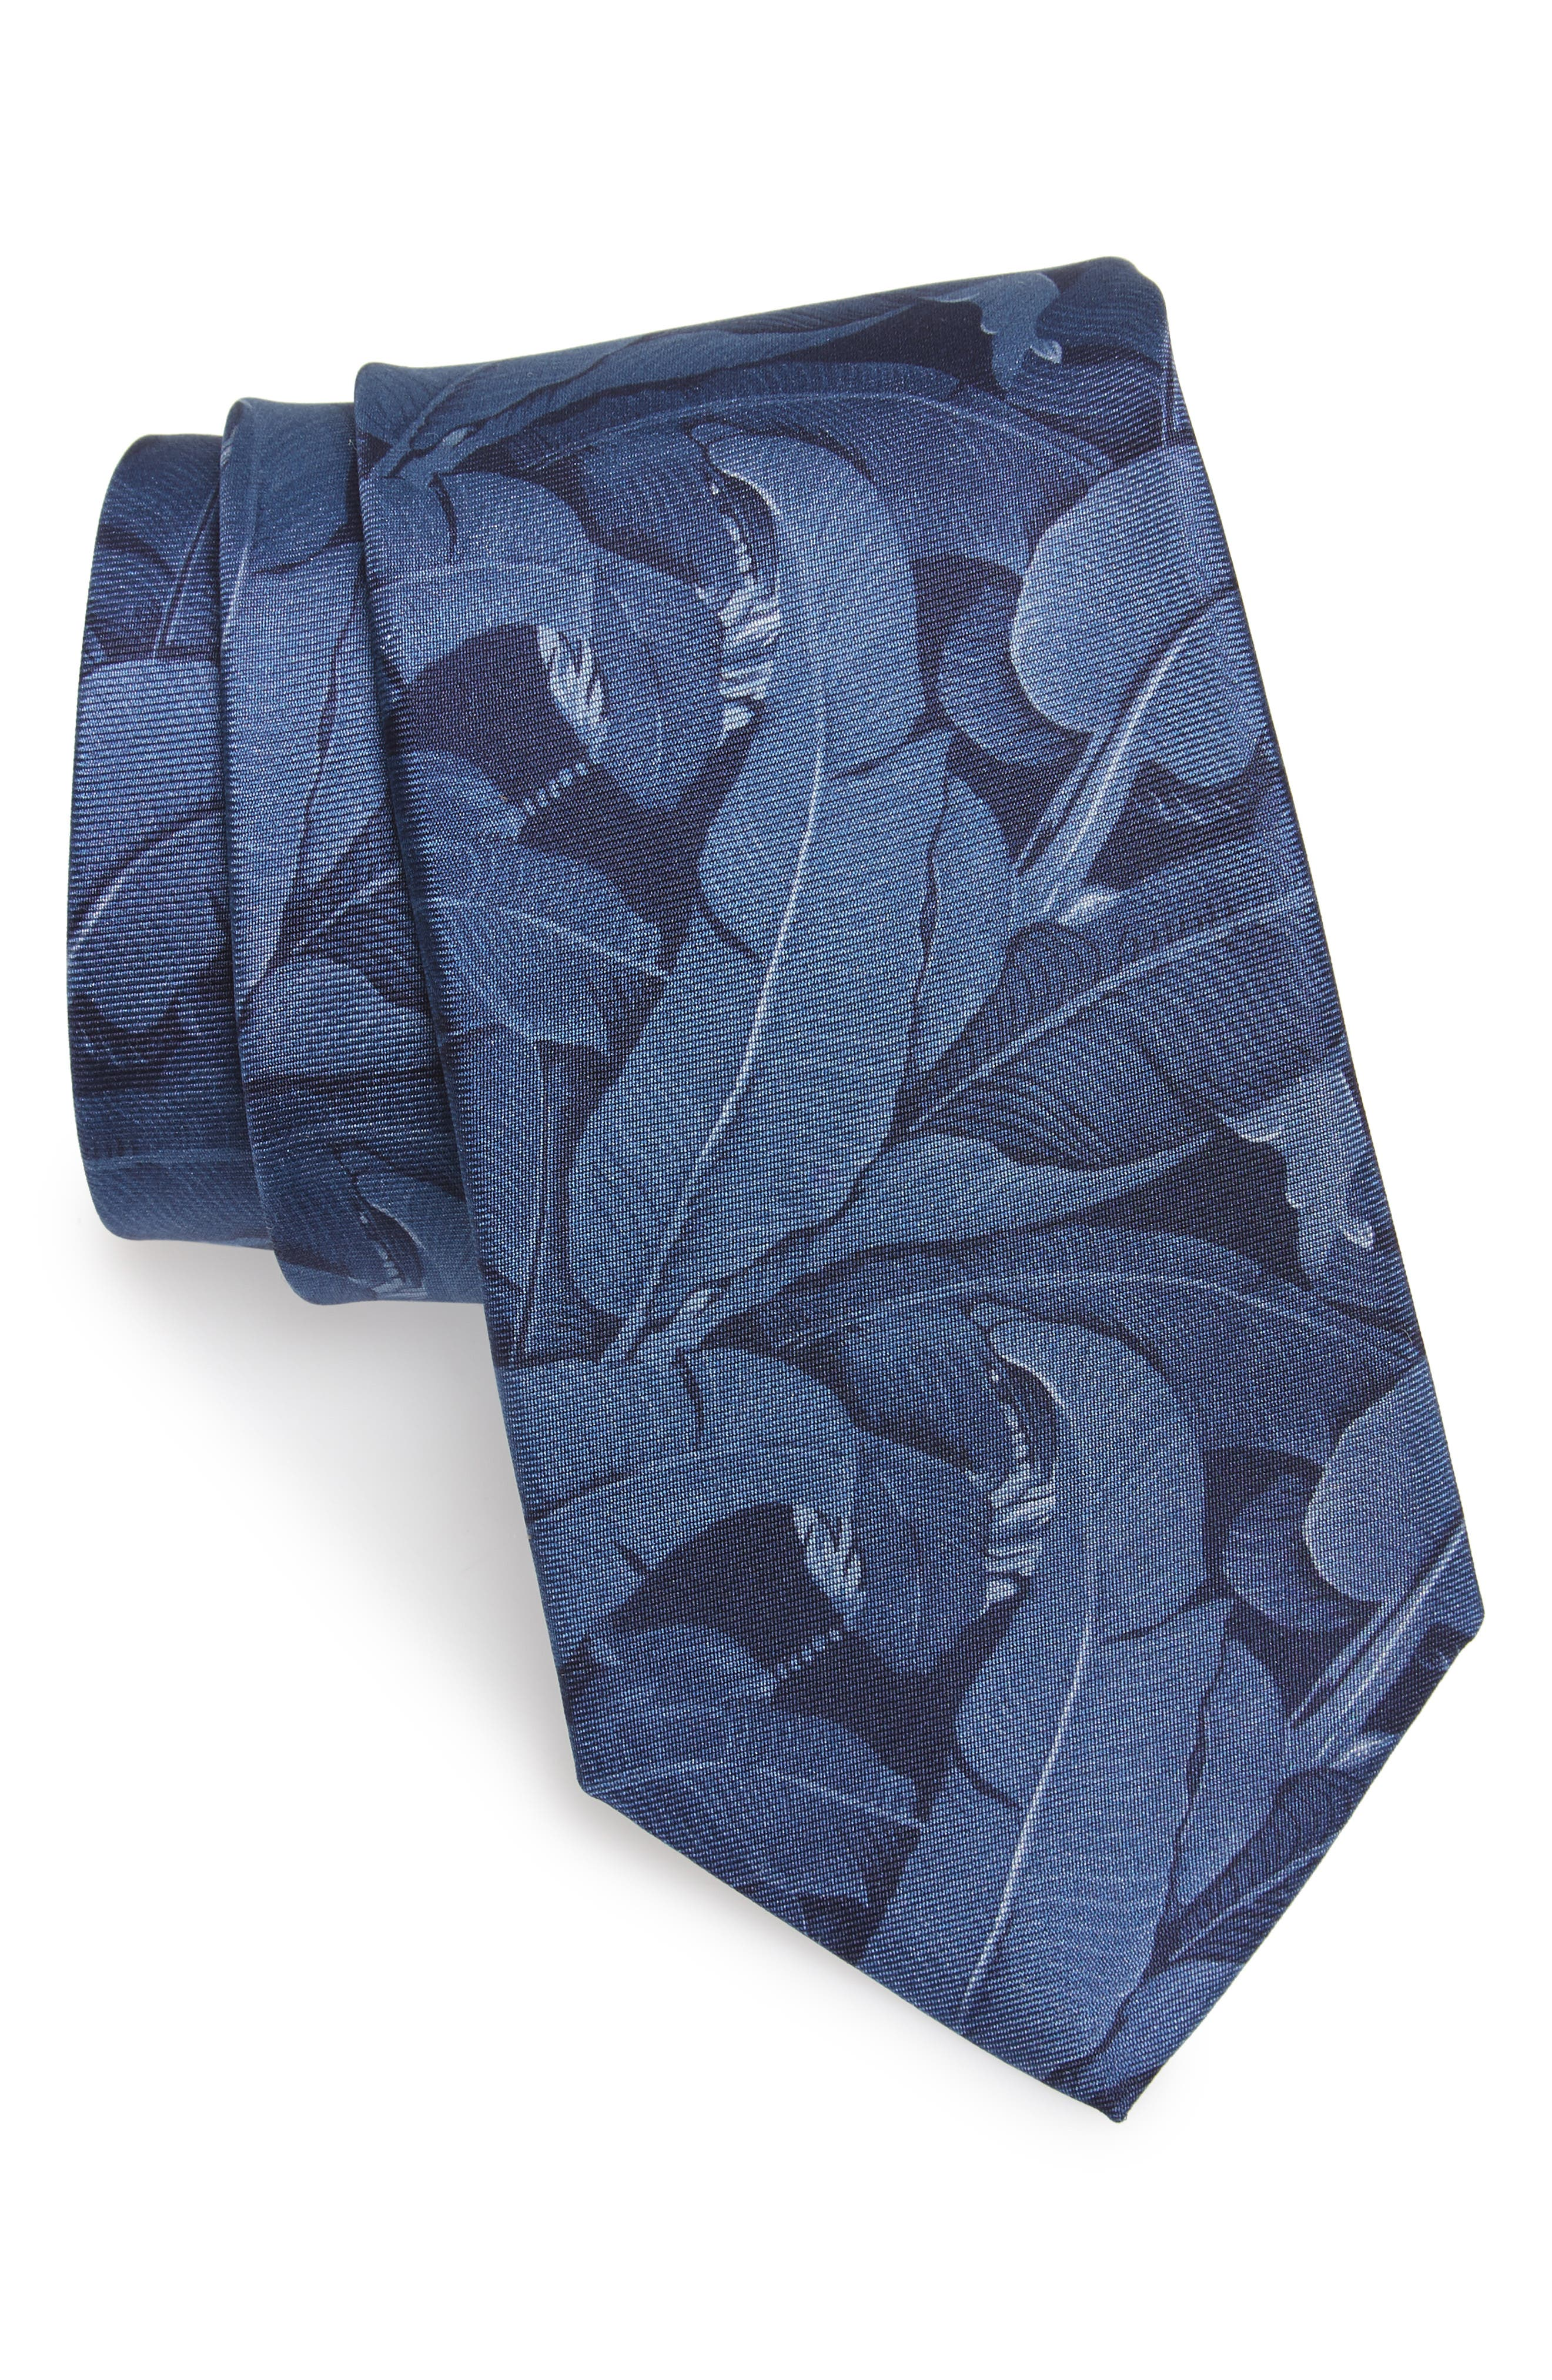 Banana Leaf Silk Tie,                         Main,                         color, 400